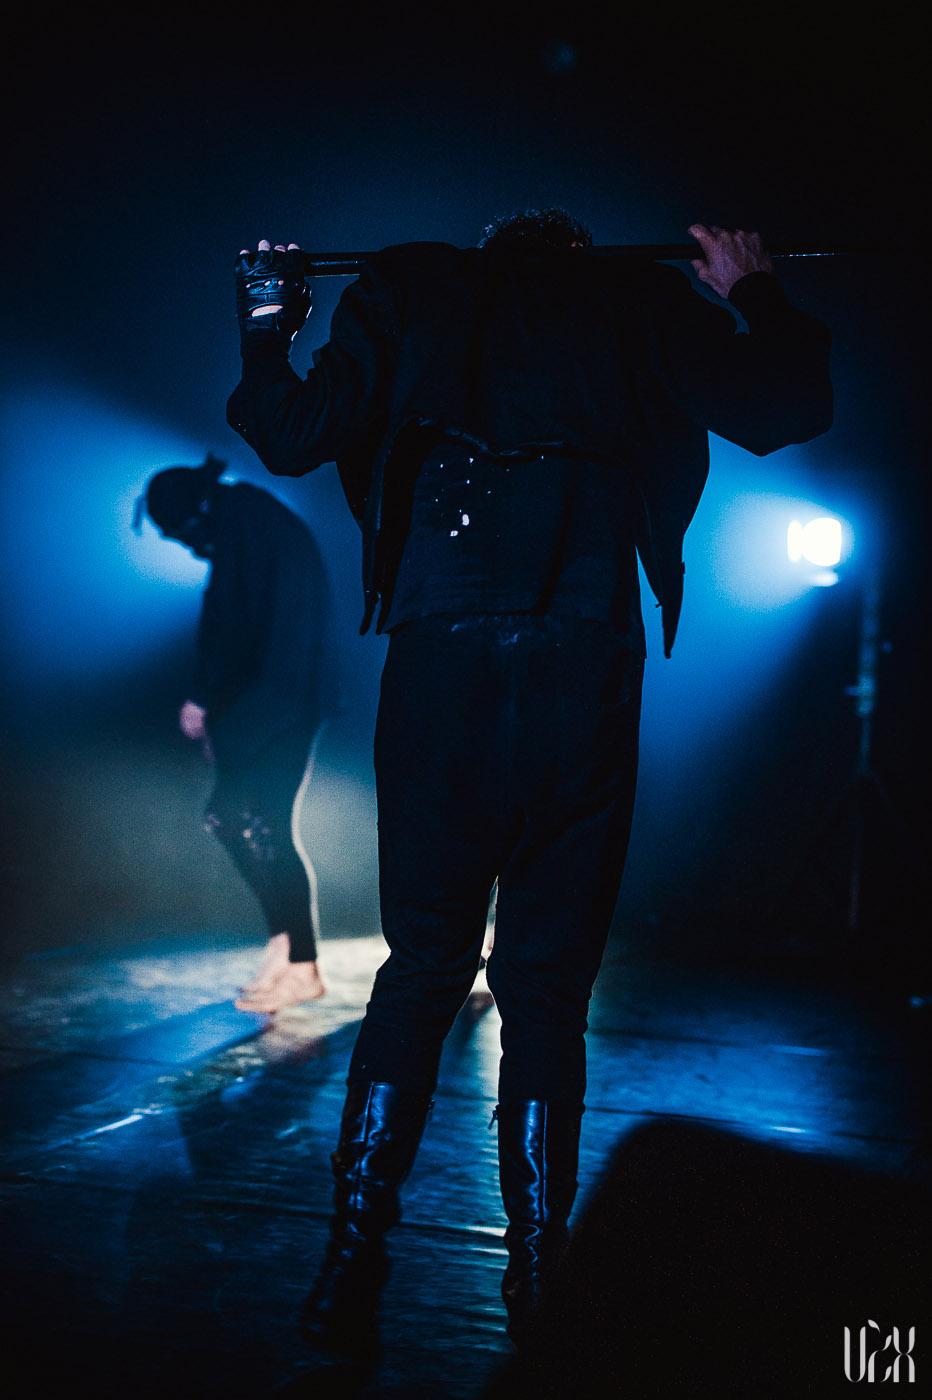 E.sabaliauskaite Vzx.lt Faustas Teatras Event 028